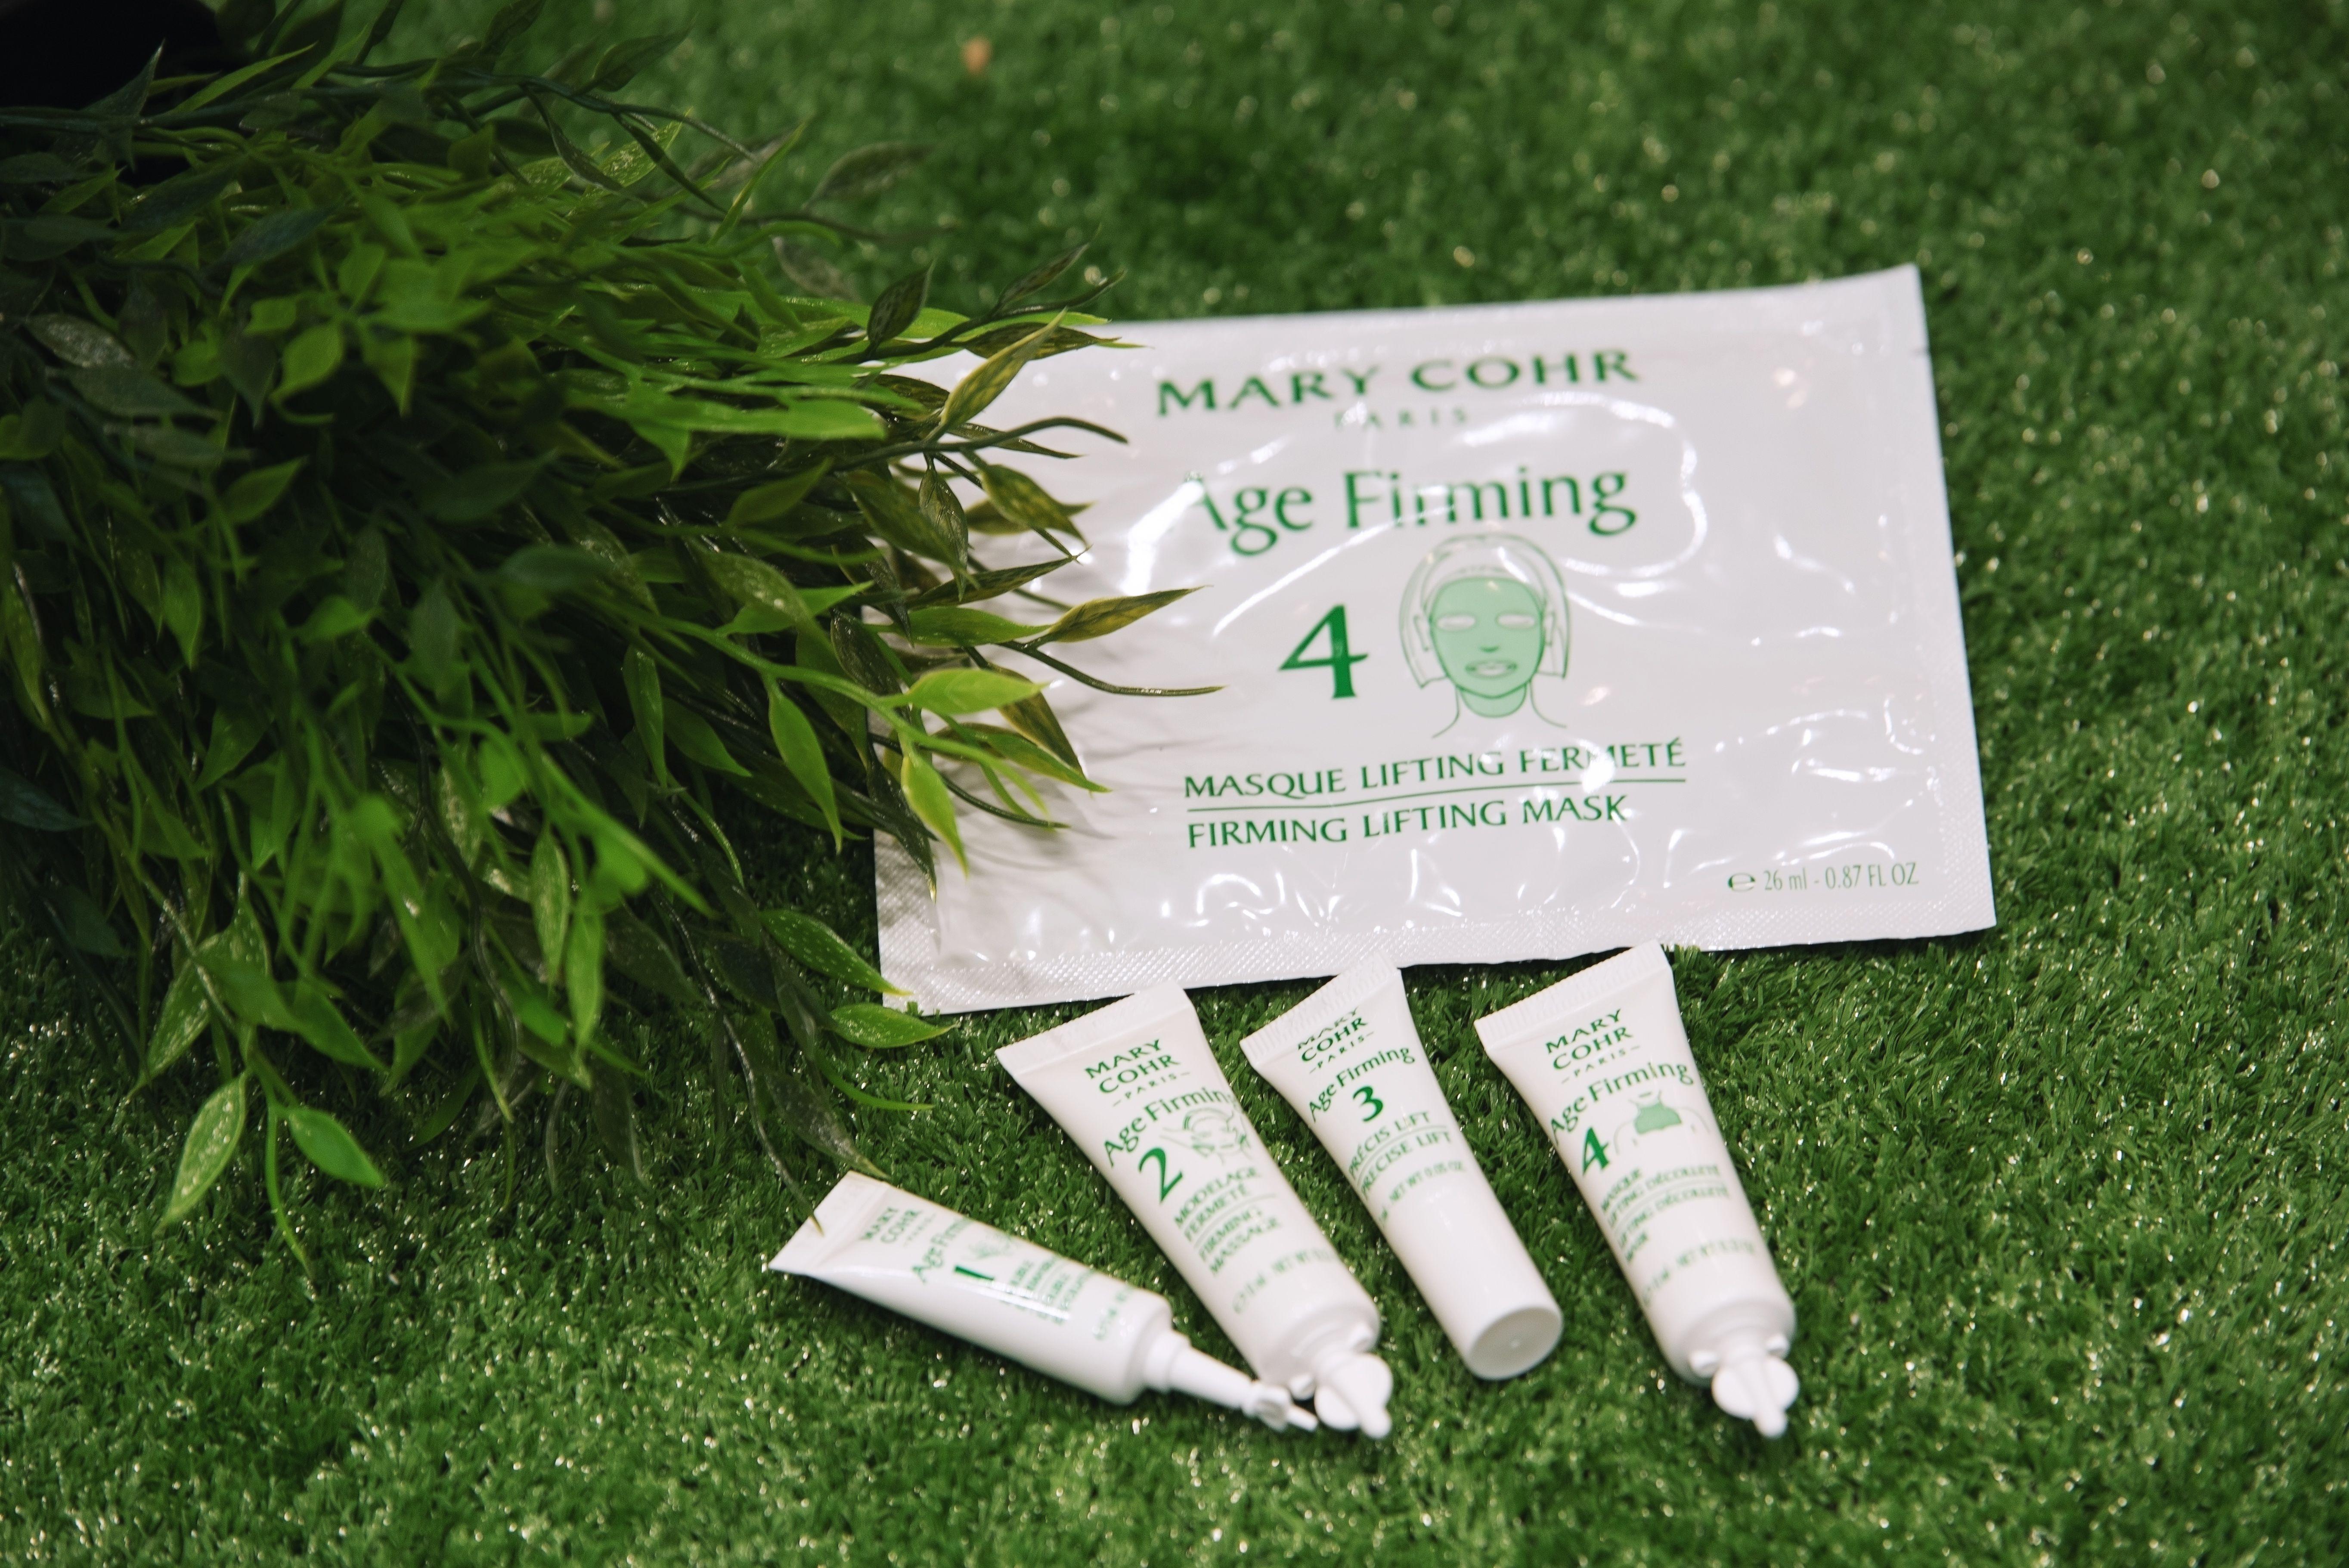 TOP LINE a lansat AGE FIRMING MARY COHR,  cel mai nou tratament complet de lifting si fermitate pentru fata, gat si decolteu